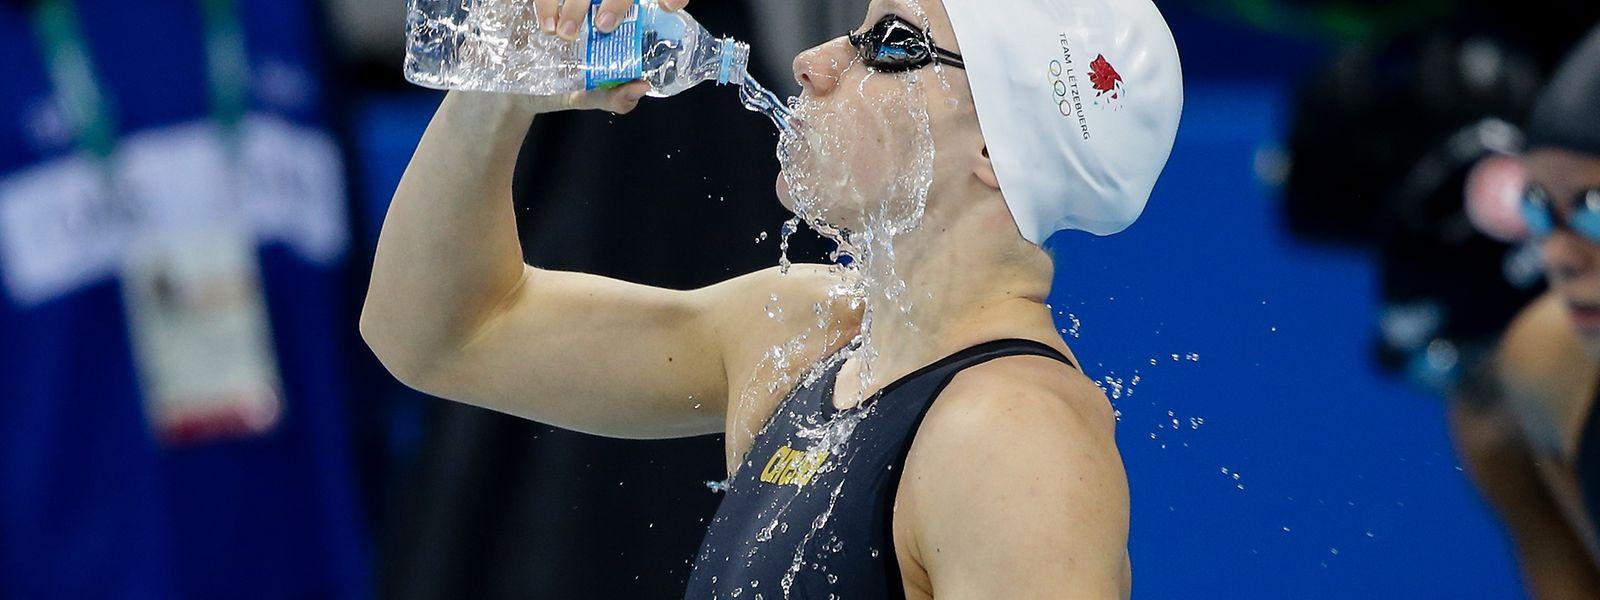 Julie Meynen verbesserte zwei Landesrekorde bei ihrem Olympiadebüt.